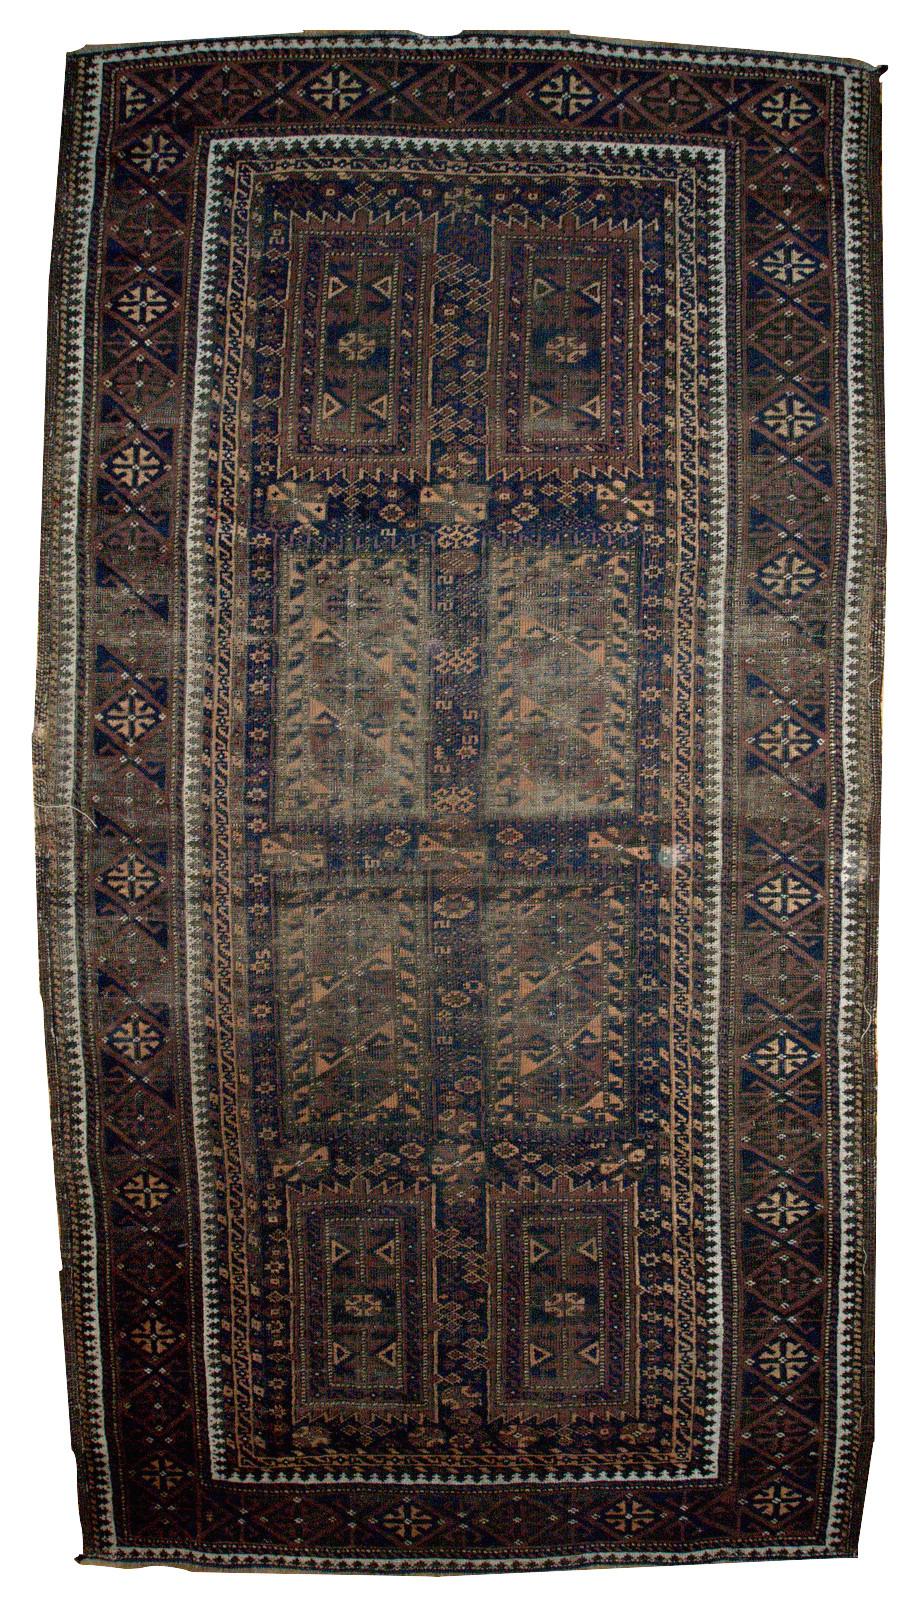 Handmade Antique Afghan Baluch Rug